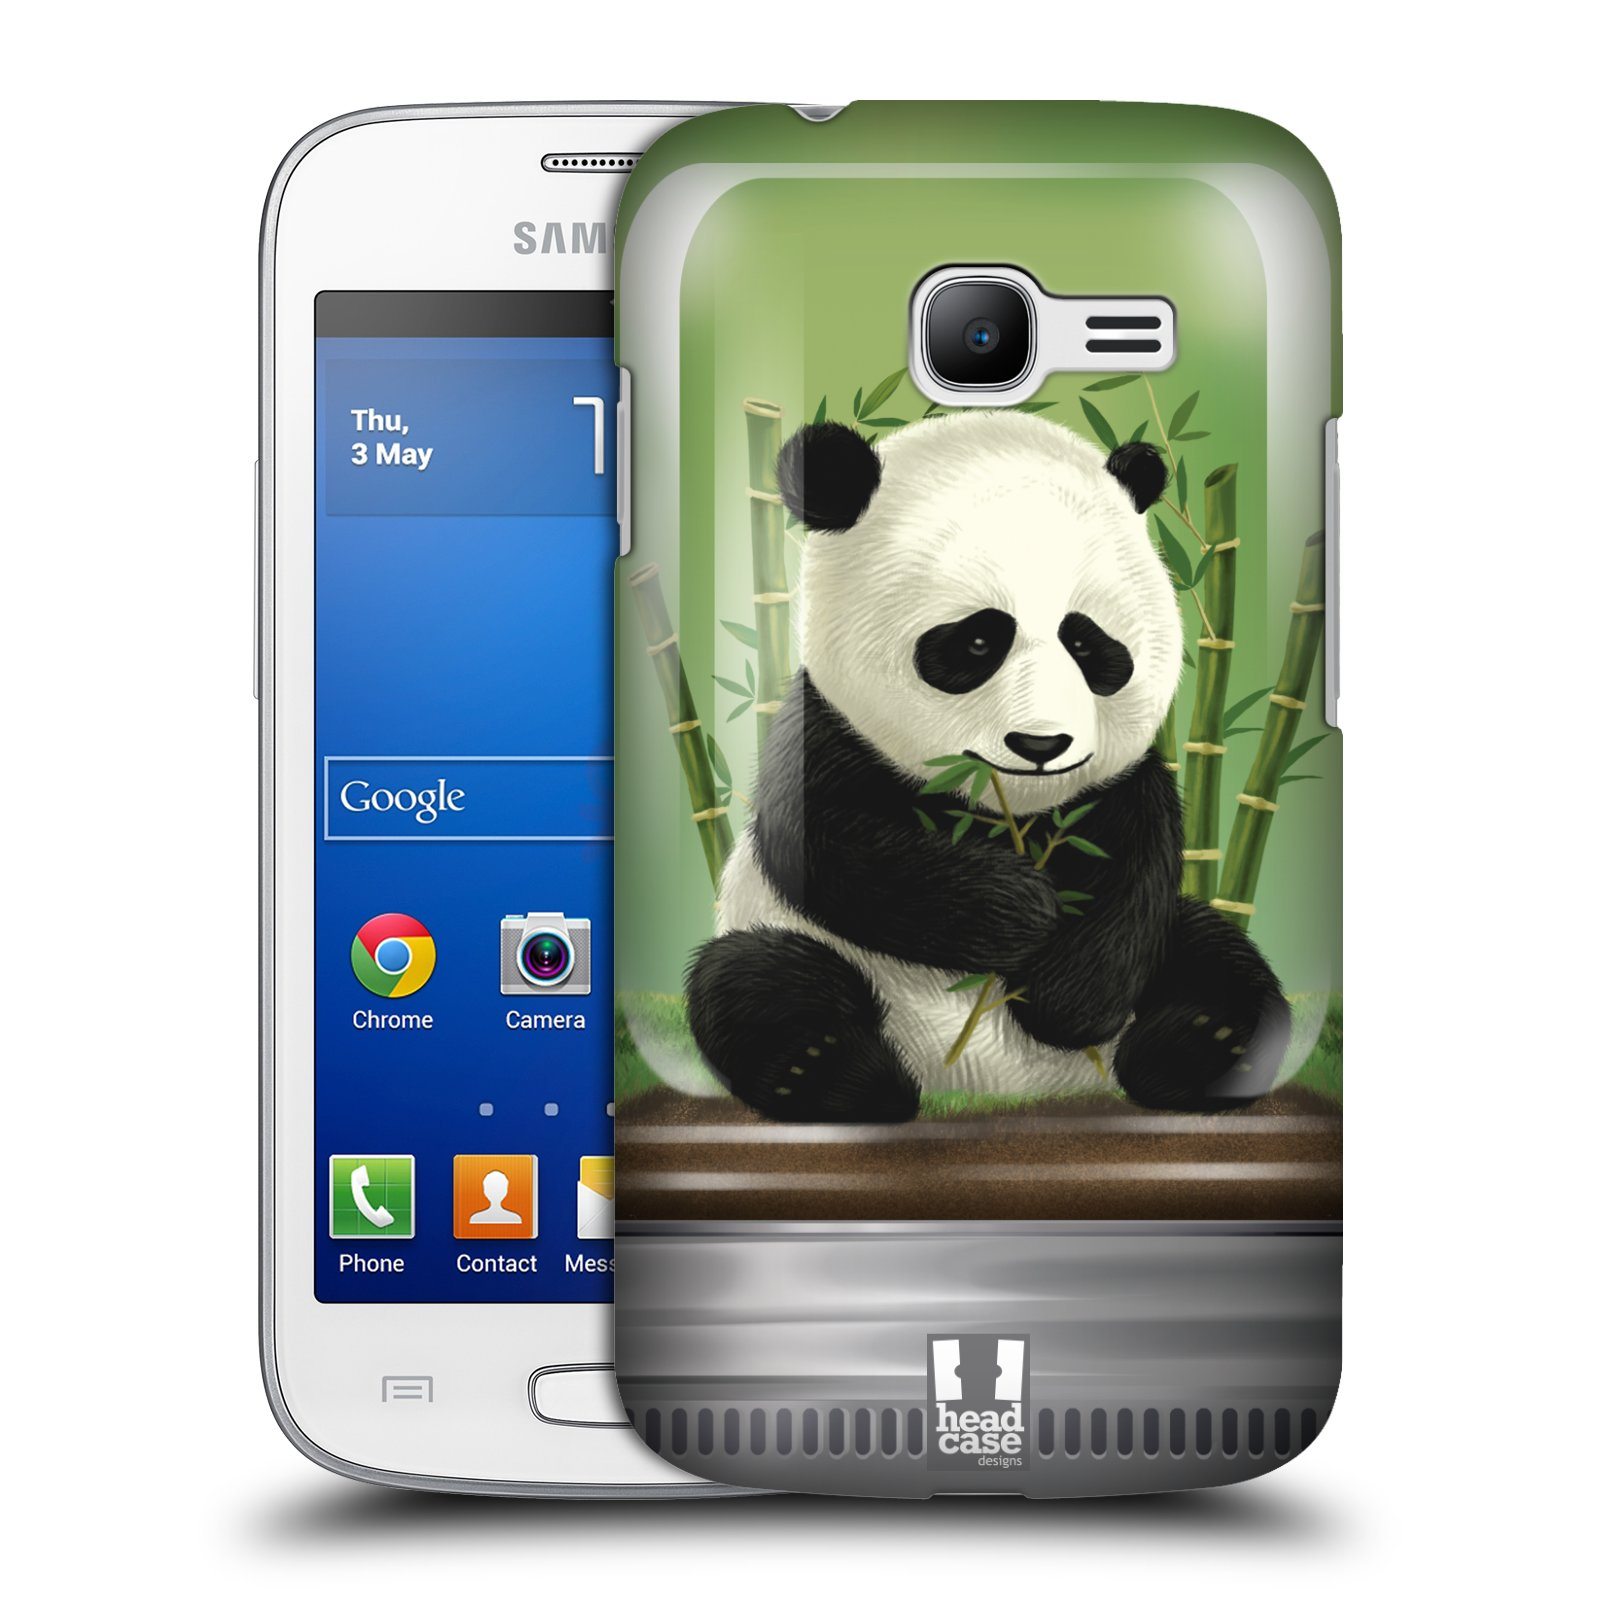 HEAD CASE plastový obal na mobil SAMSUNG GALAXY Star Pro S7260/S7262 DUOS vzor Zvířátka v těžítku panda